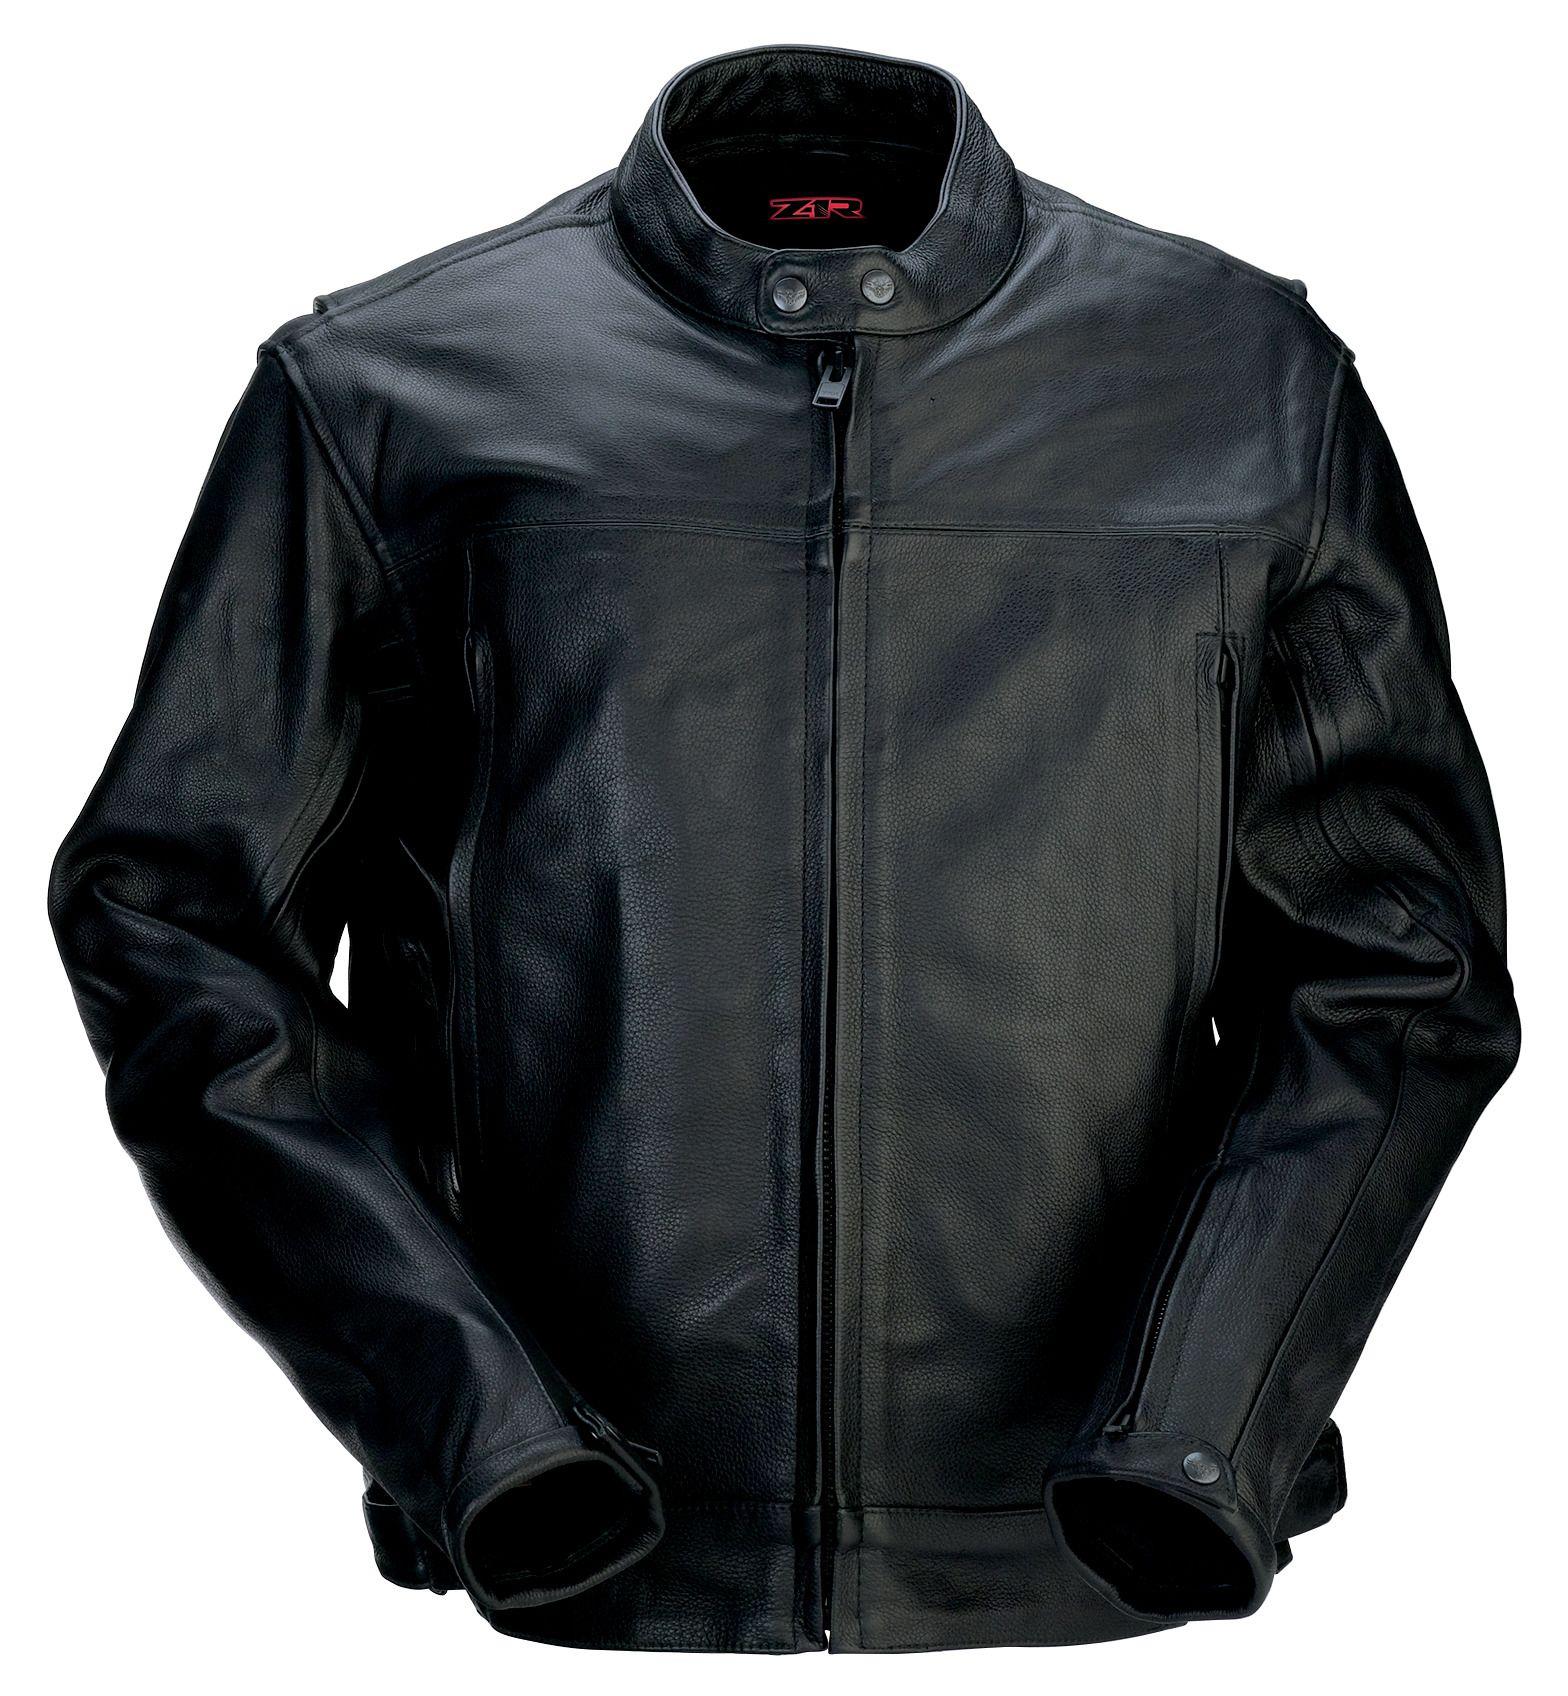 Leather jacket sale - Leather Jacket Sale 58